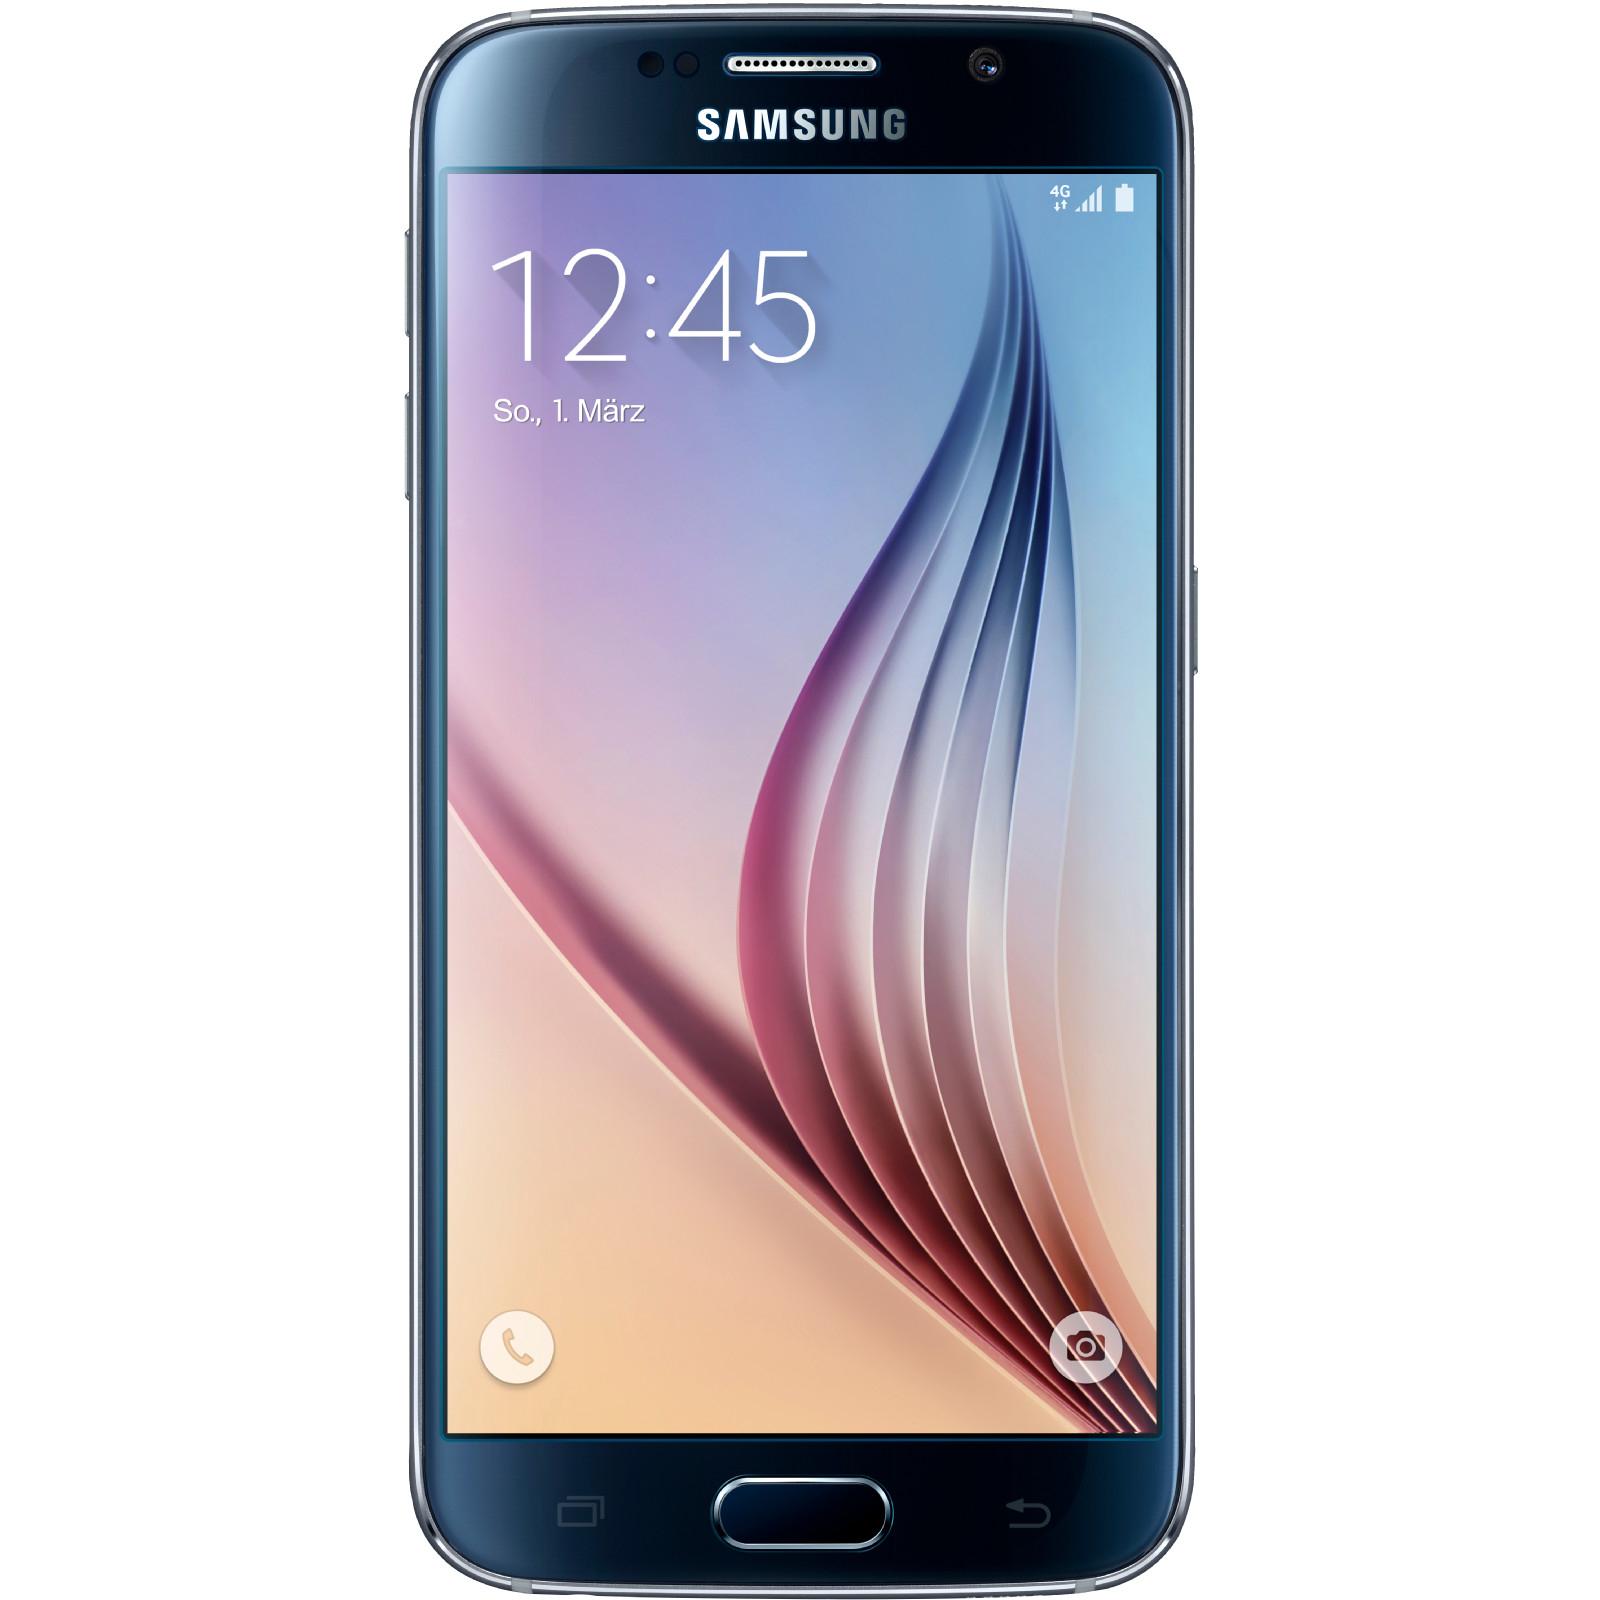 [Mediamarkt/Saturn/Ebay Mediamarkt] SAMSUNG Galaxy S6 Juke Edition 32 GB